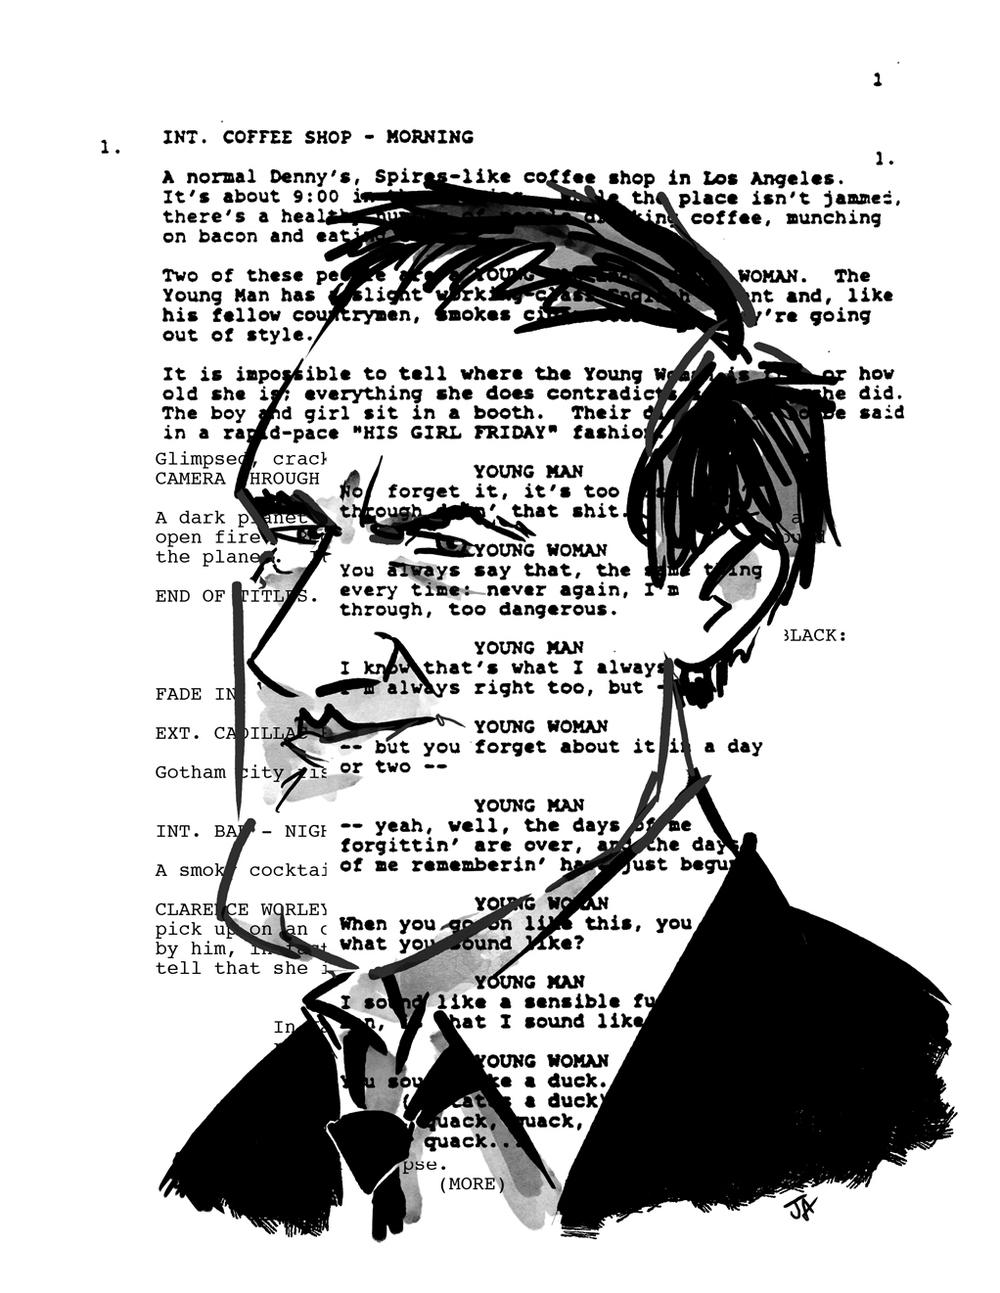 Quentin Tarantino / Pulp Fiction